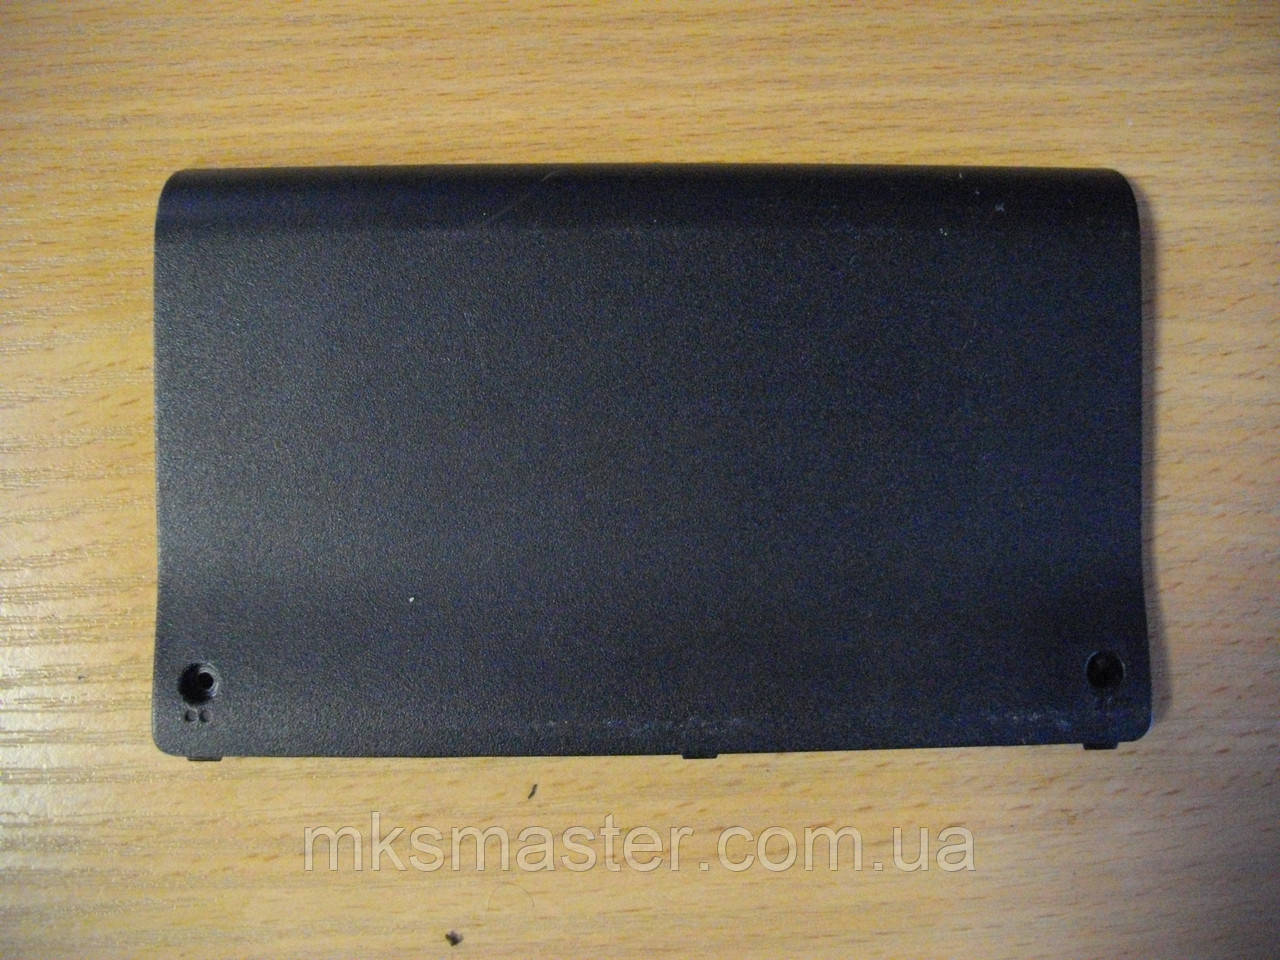 Сервисная Крышка HDD Люк Корпус от ноутбука SONY PCG-61611V бу